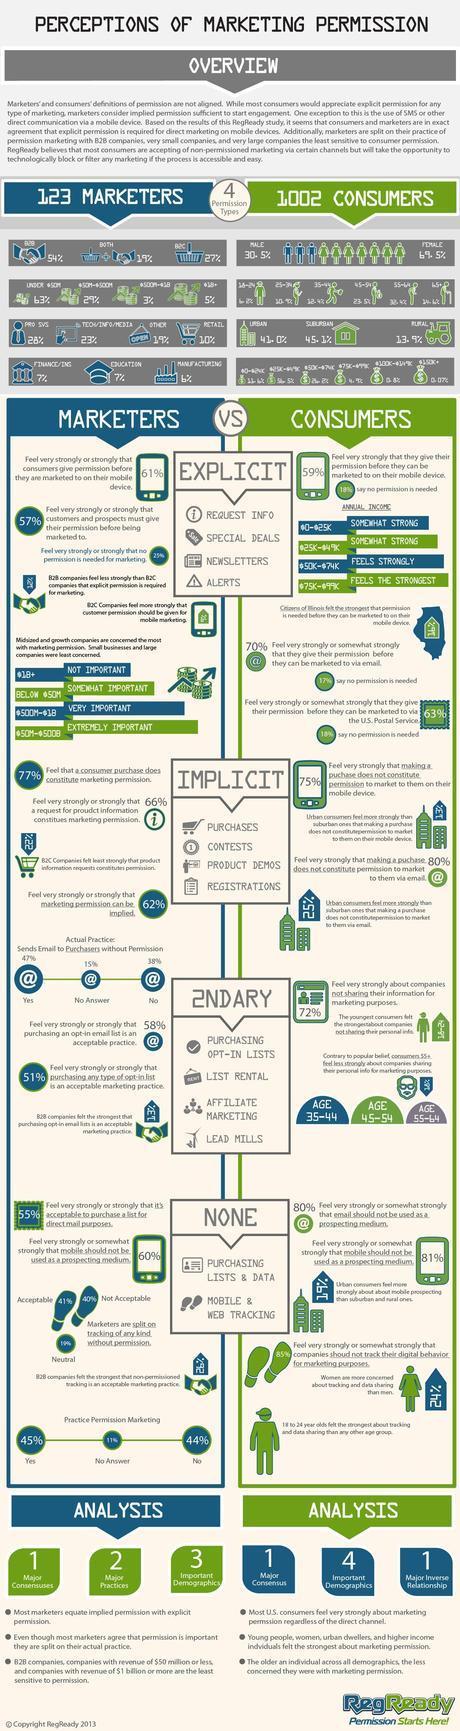 Permission Marketing Infographic